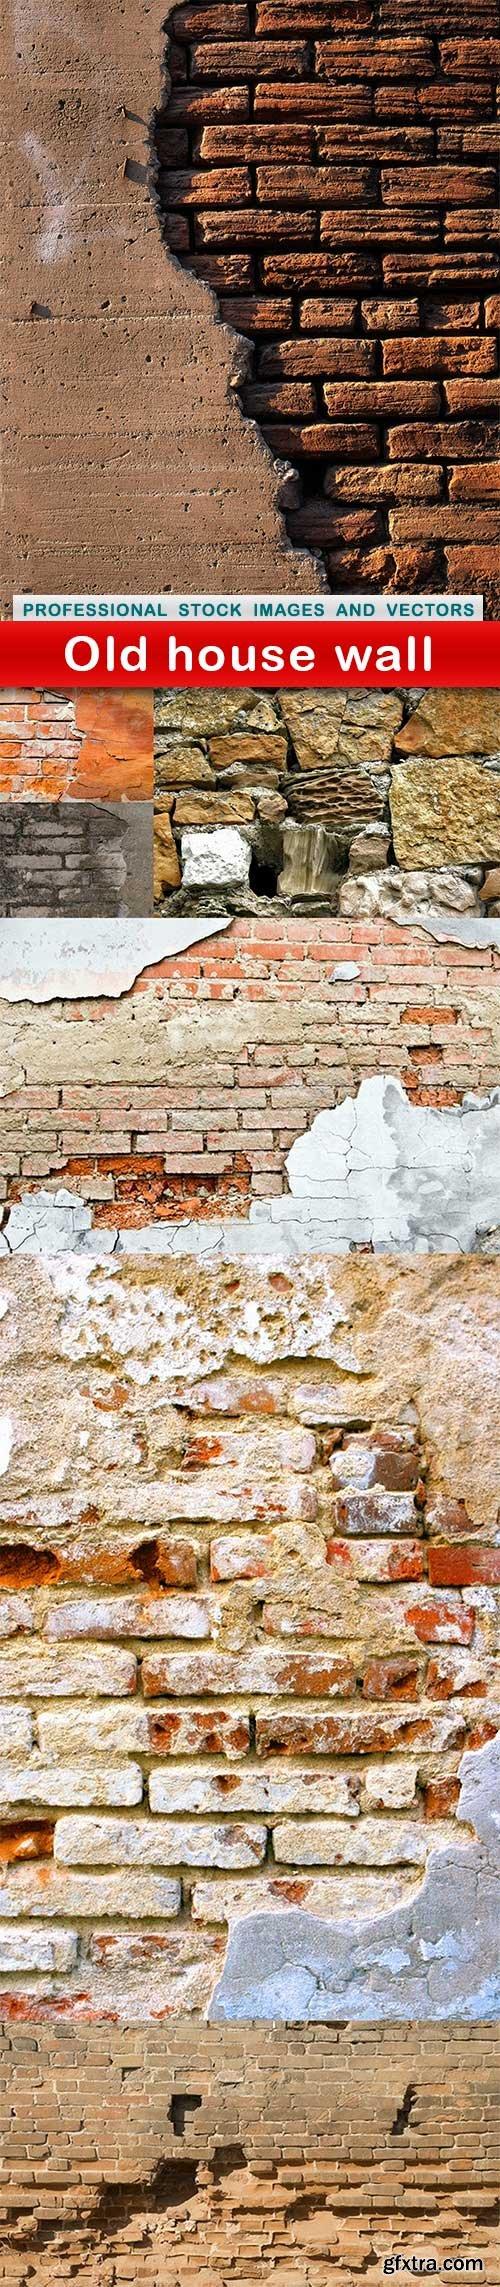 Old house wall - 7 UHQ JPEG